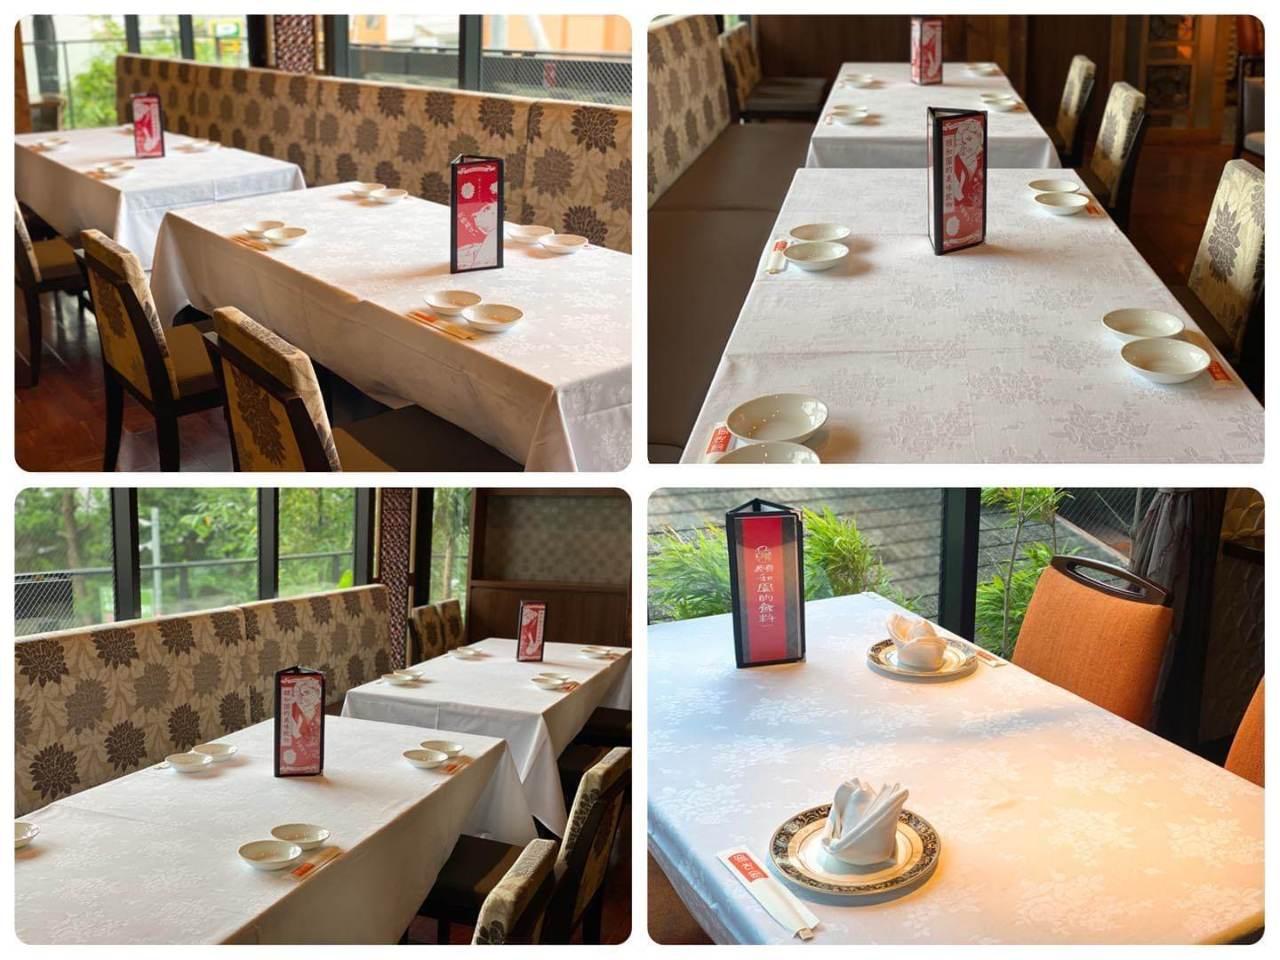 China Garden Iwaen Tenjinten Imaizumi Chinese Gurunavi Restaurant Guide